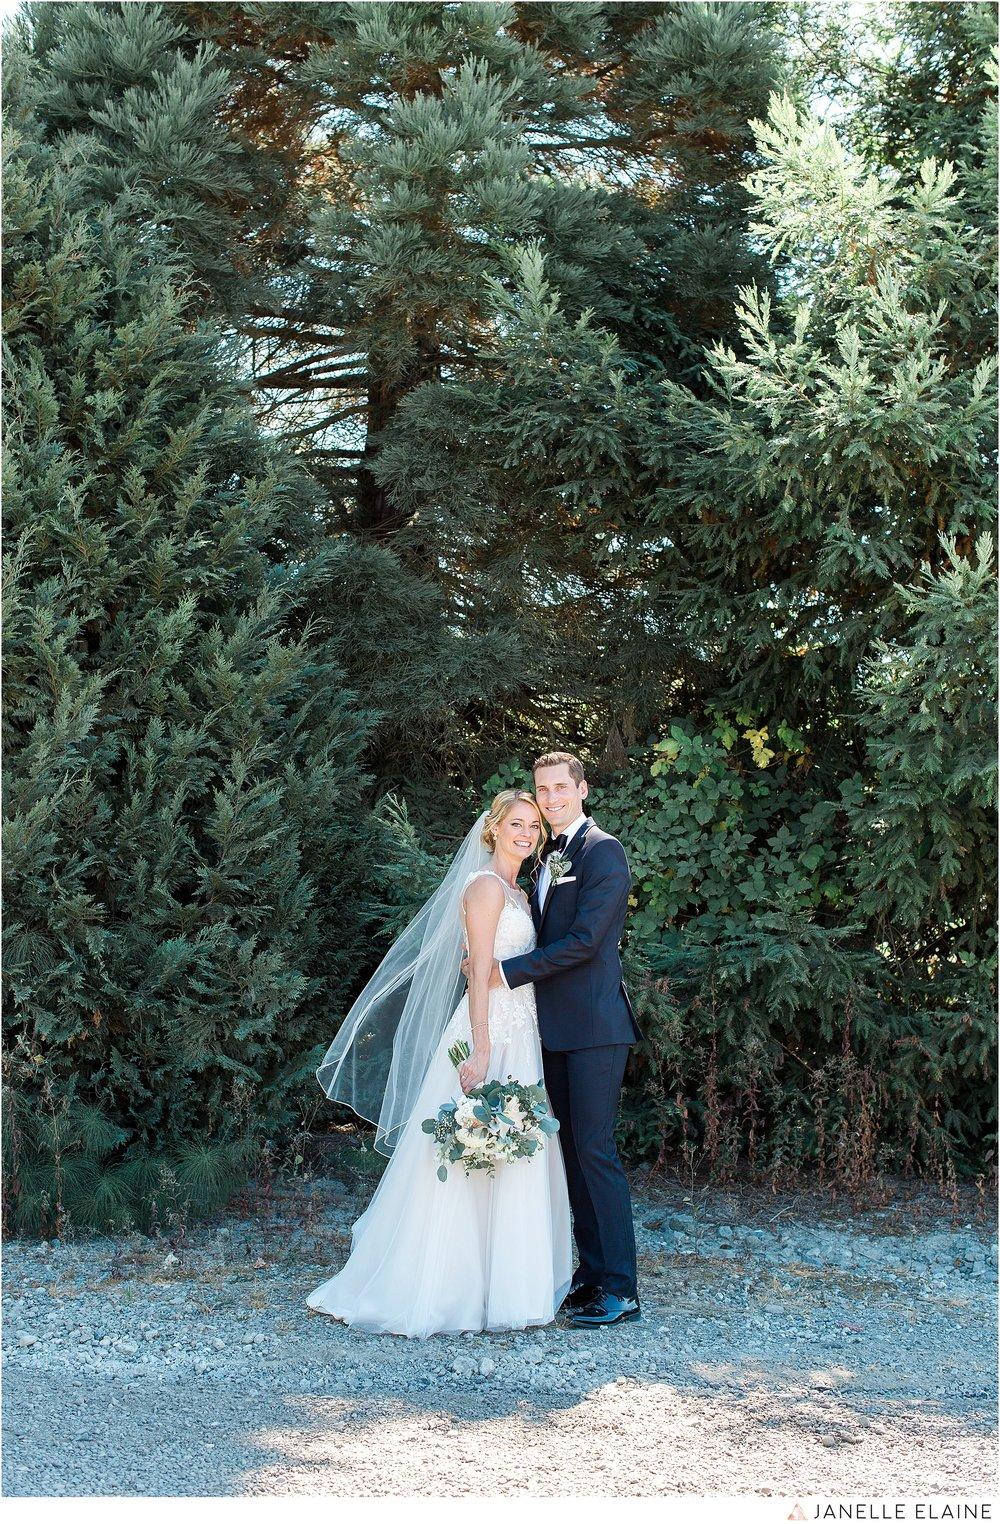 janelle elaine photography-carleton farms-washington-wedding-lake stevens-67.jpg